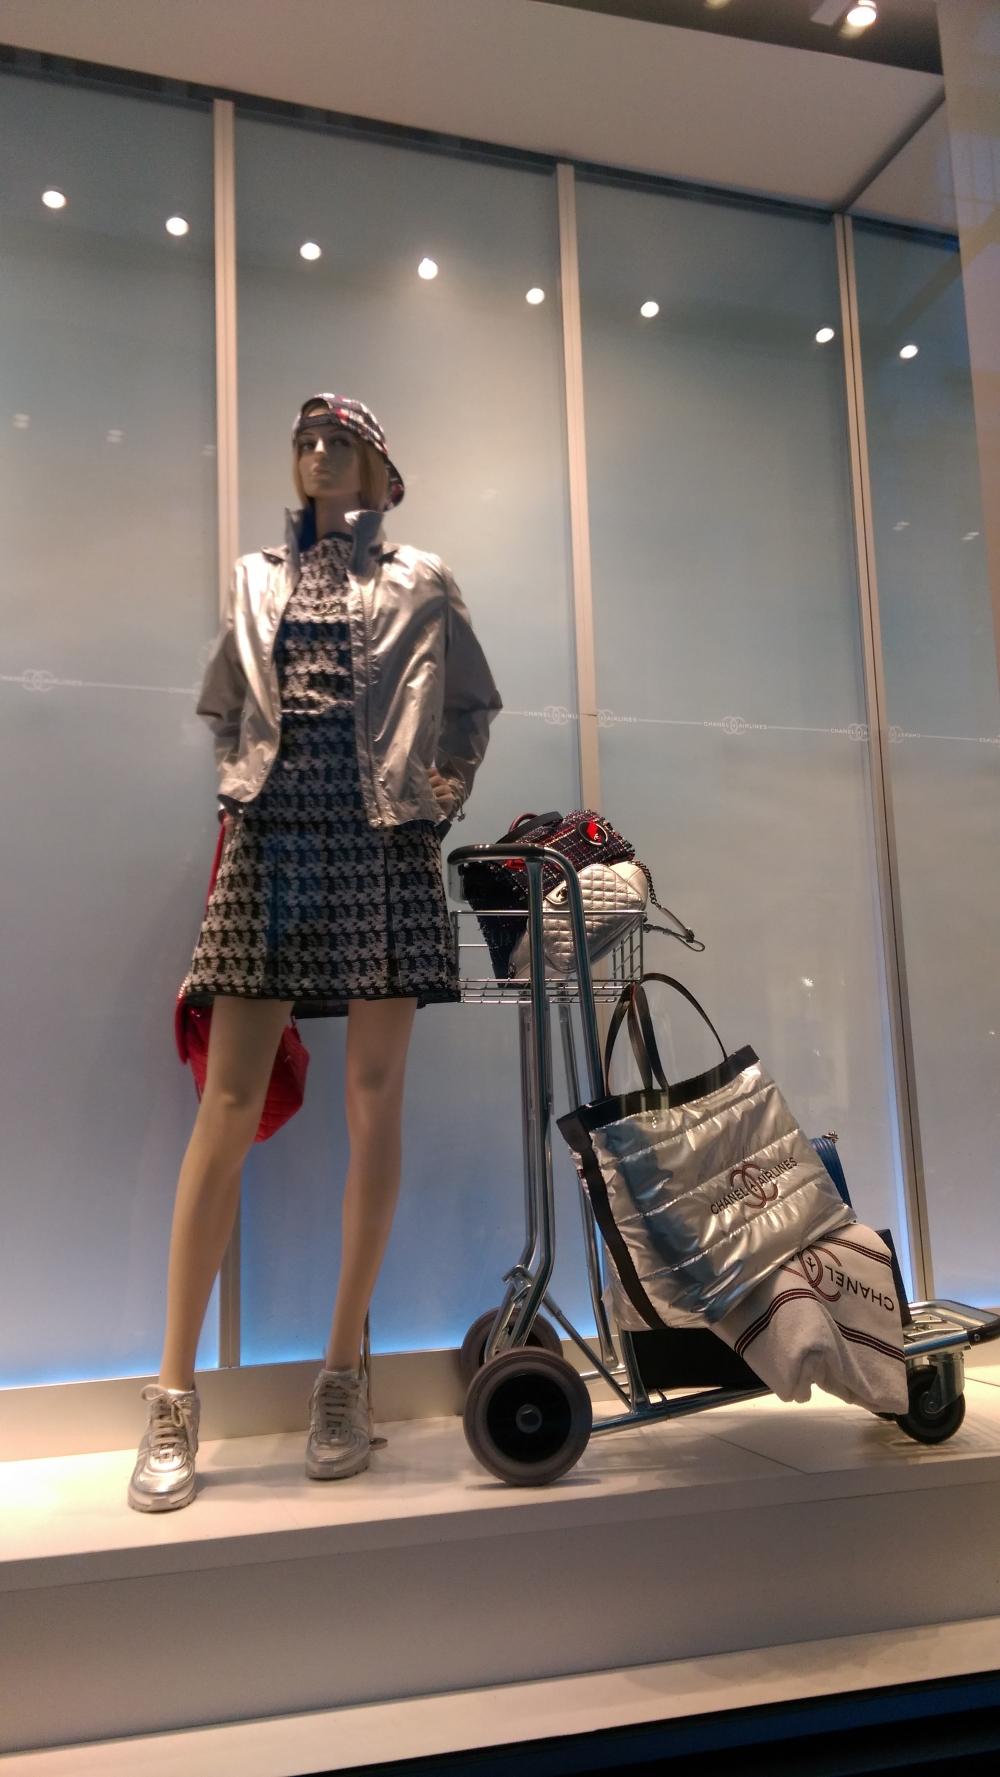 chanel shop in brussels, window shopping in brussels, shopping streets in brussels, glamthug blog, belgian fashion